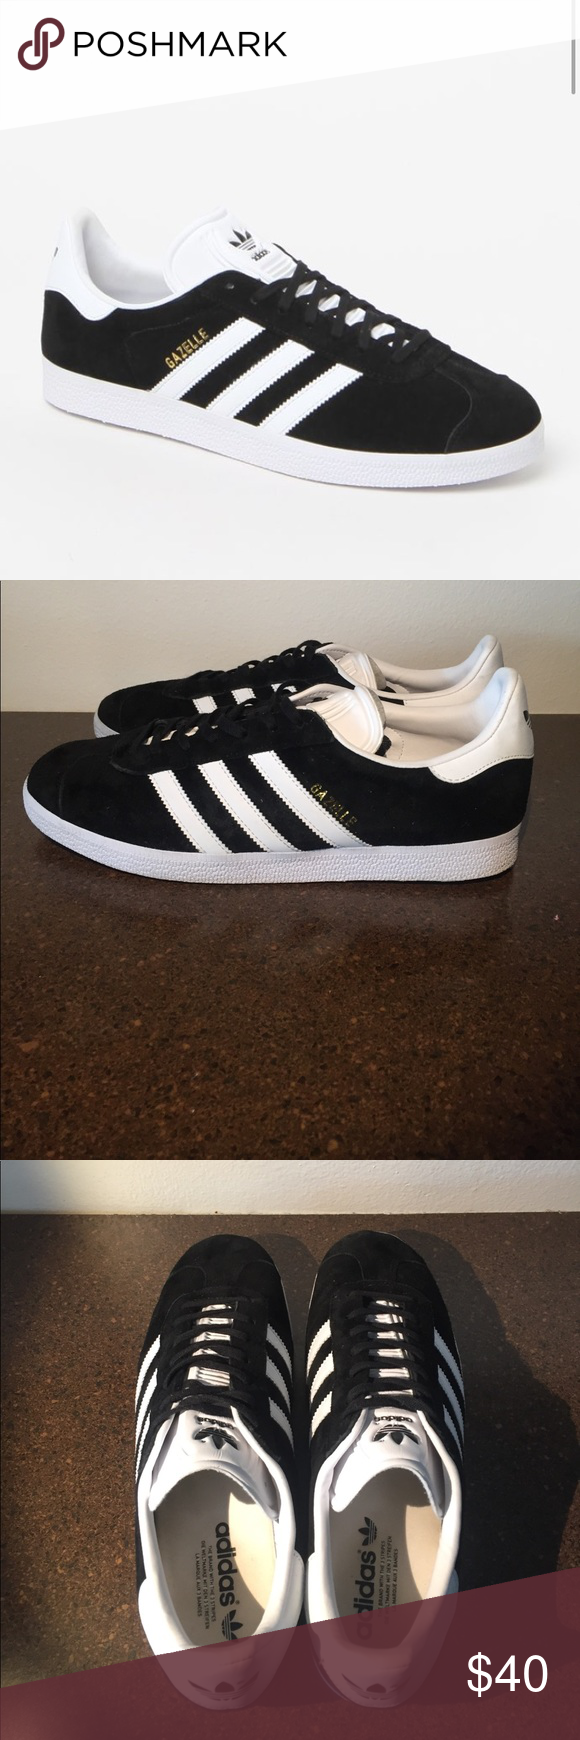 Adidas gazzella street scarpe pinterest adidas gazzella, adidas e